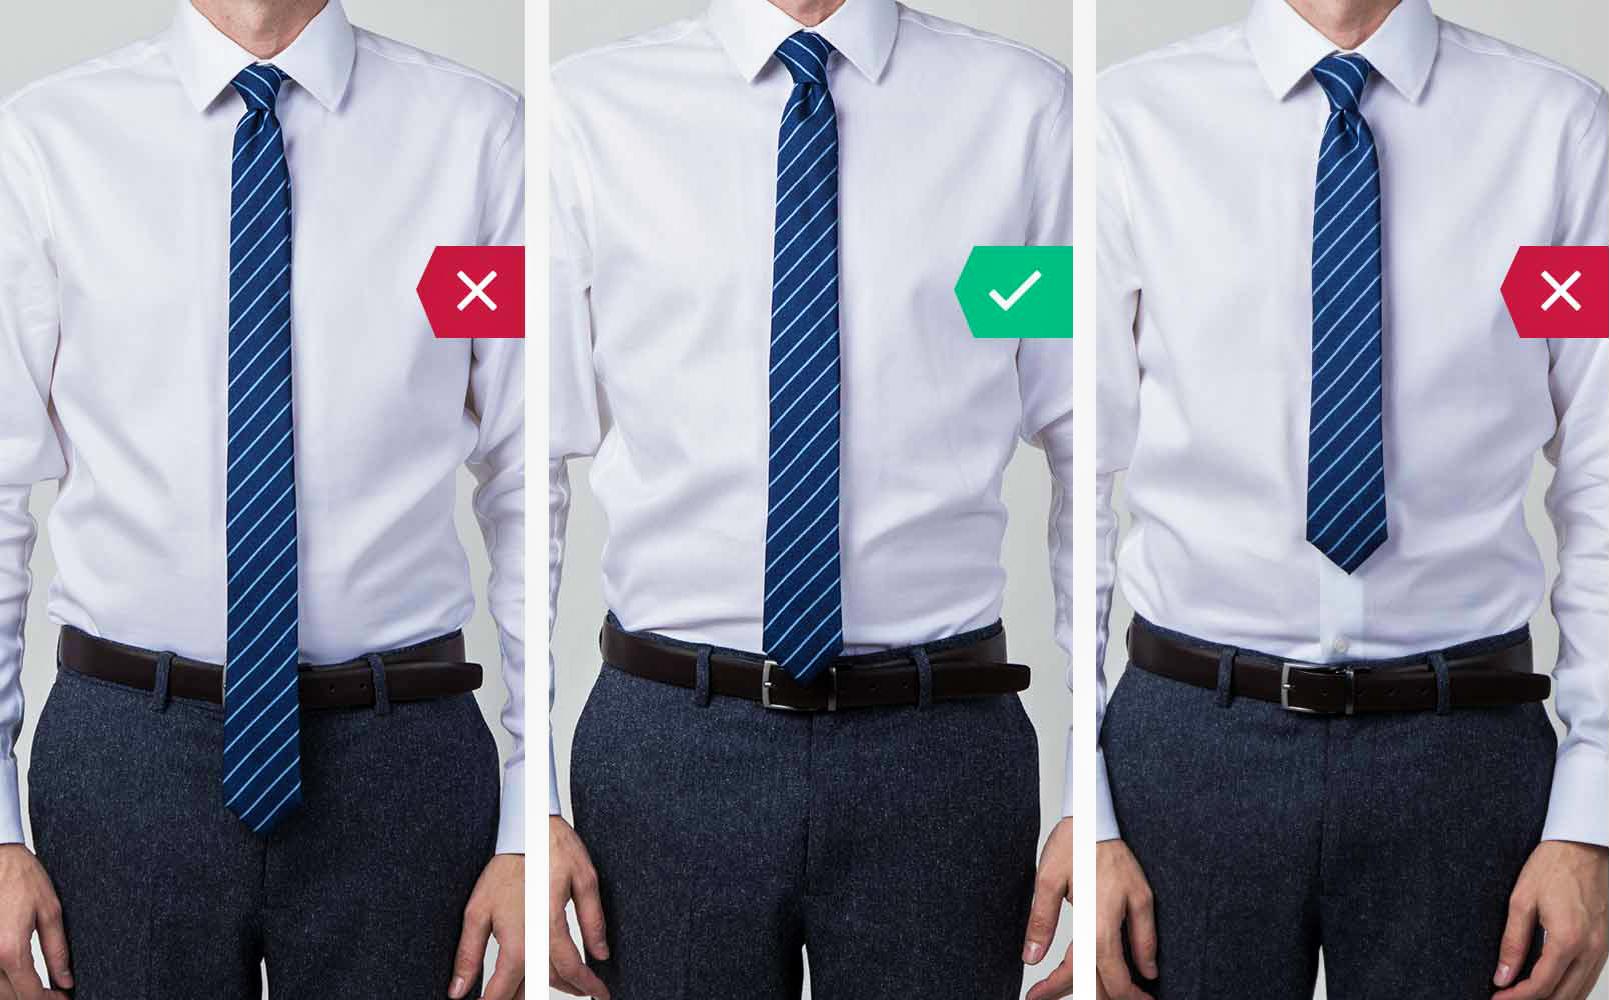 Мужчины в рубашке с галстуком